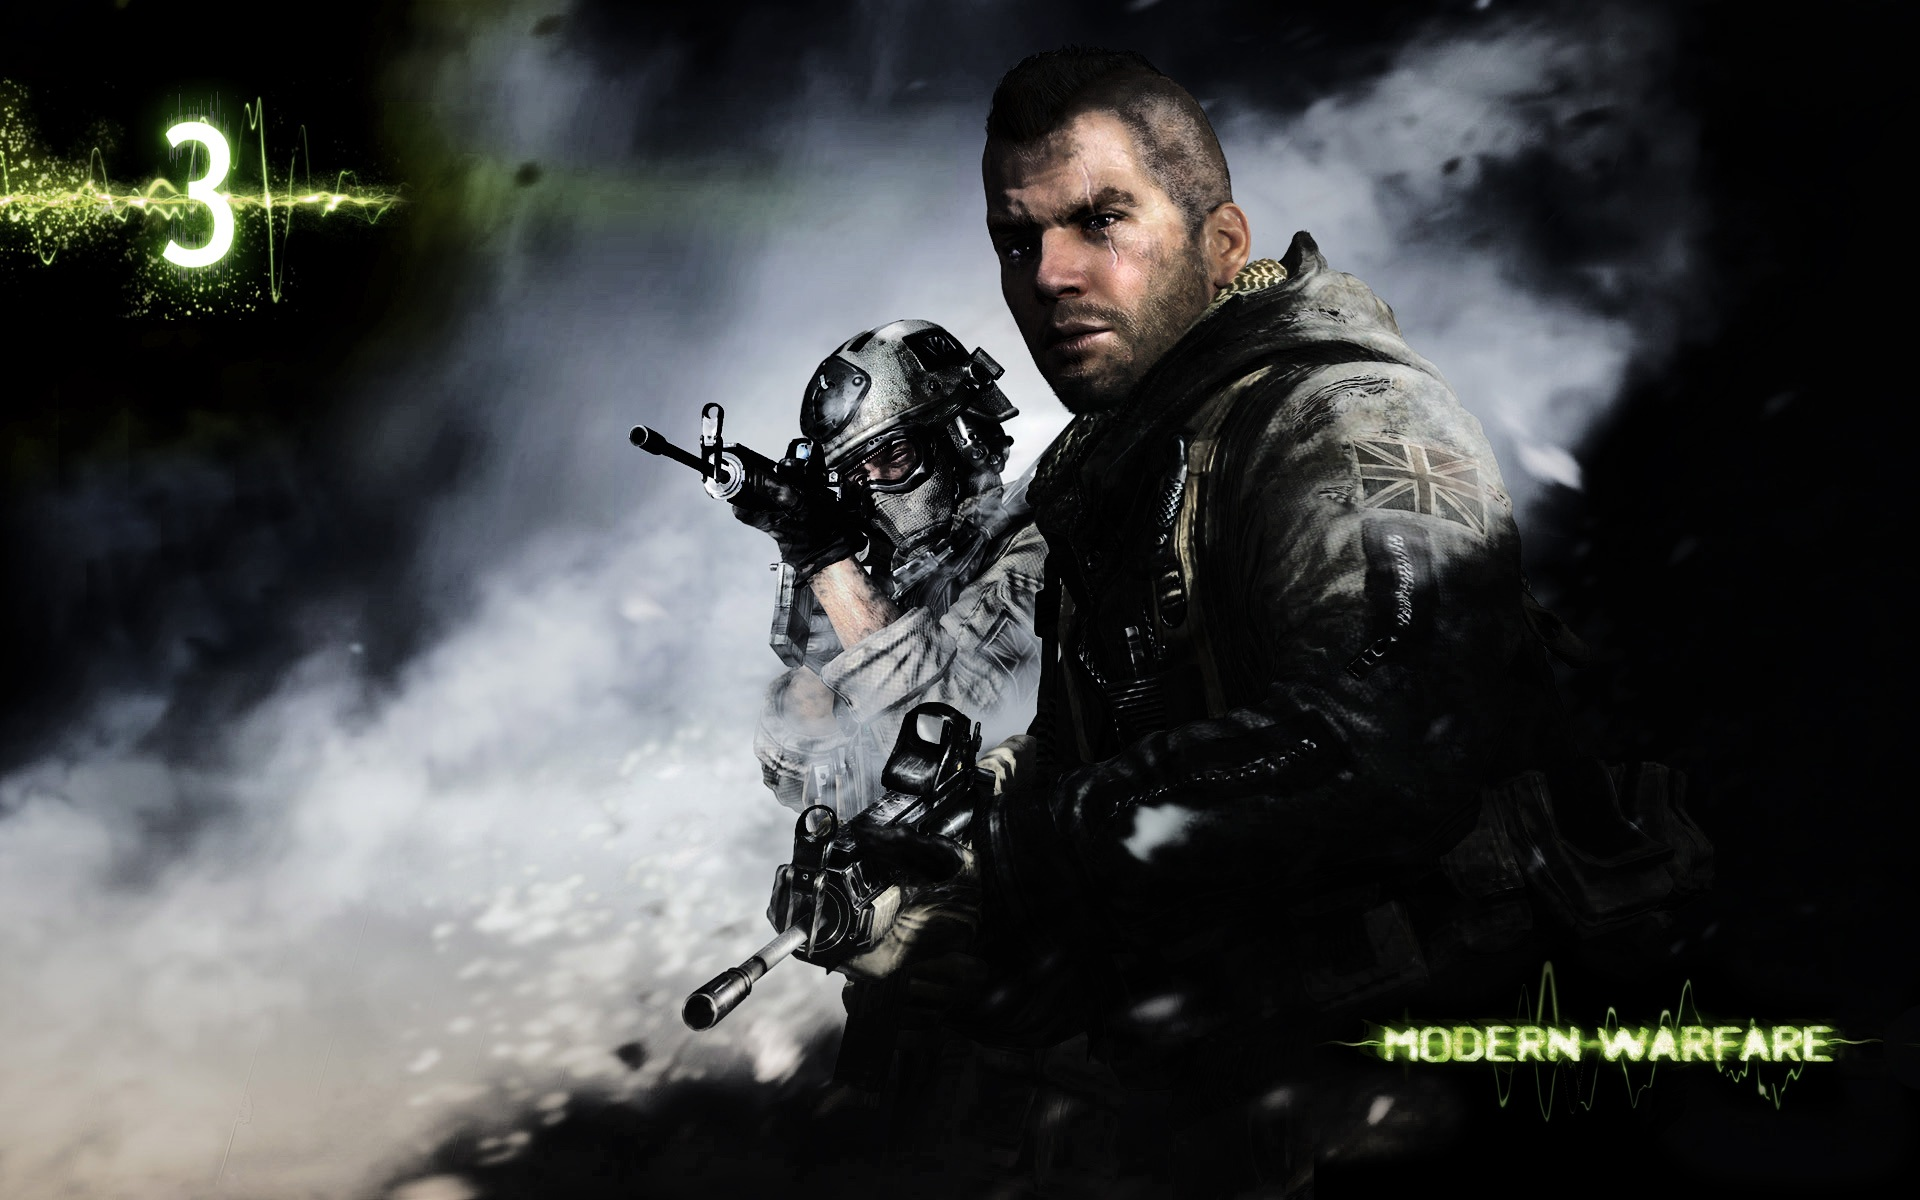 Call-of-Duty-Modern-Warfare-3_1920x1200.jpg